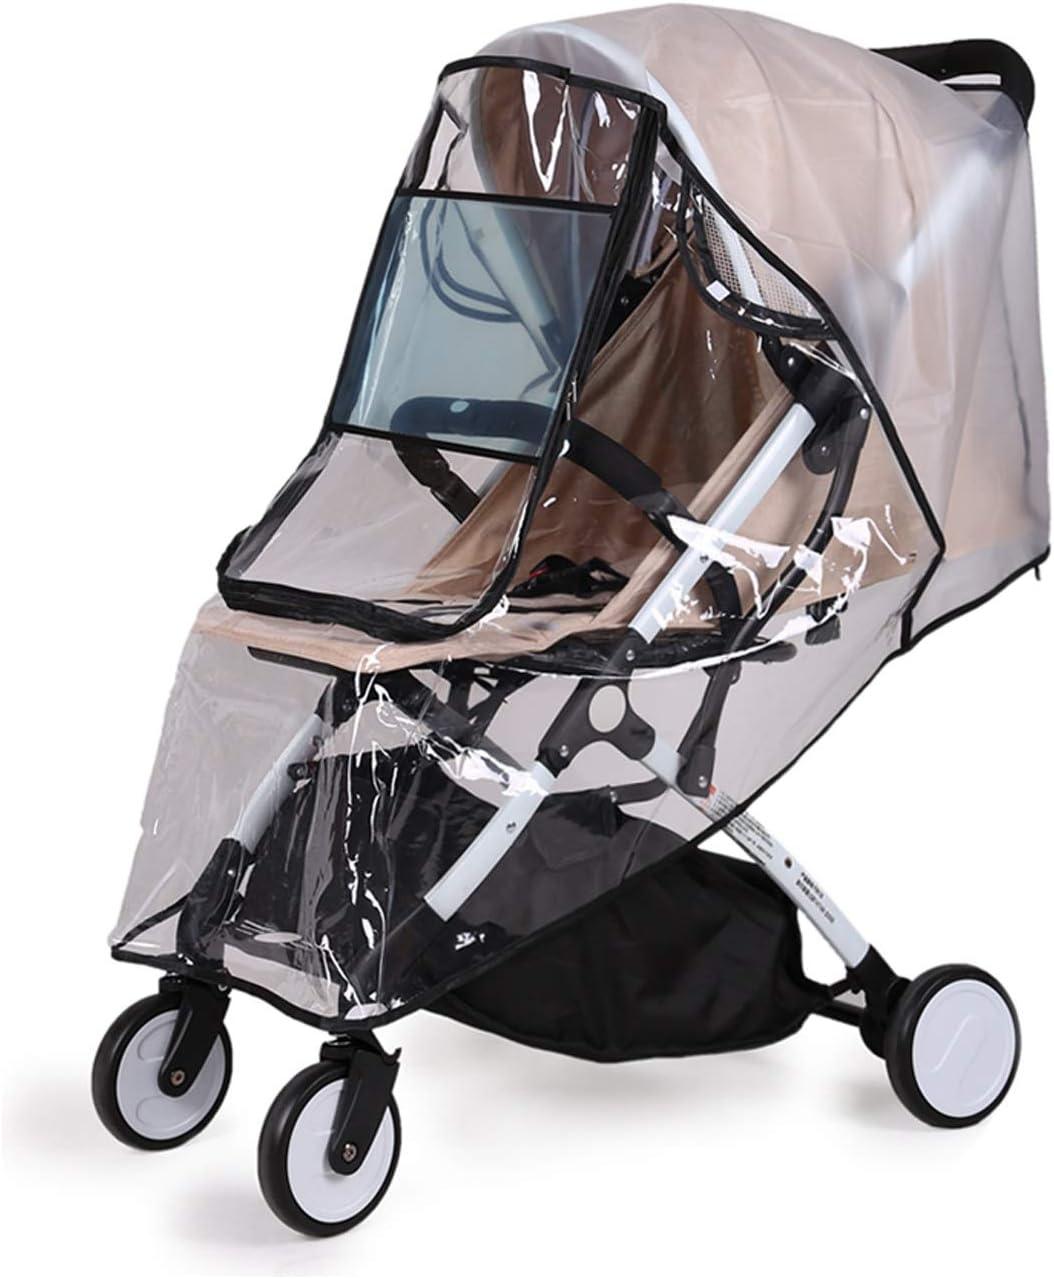 New Universal Buggy Pushchair Stroller Pram Transparent Rain Cover Baby Fast